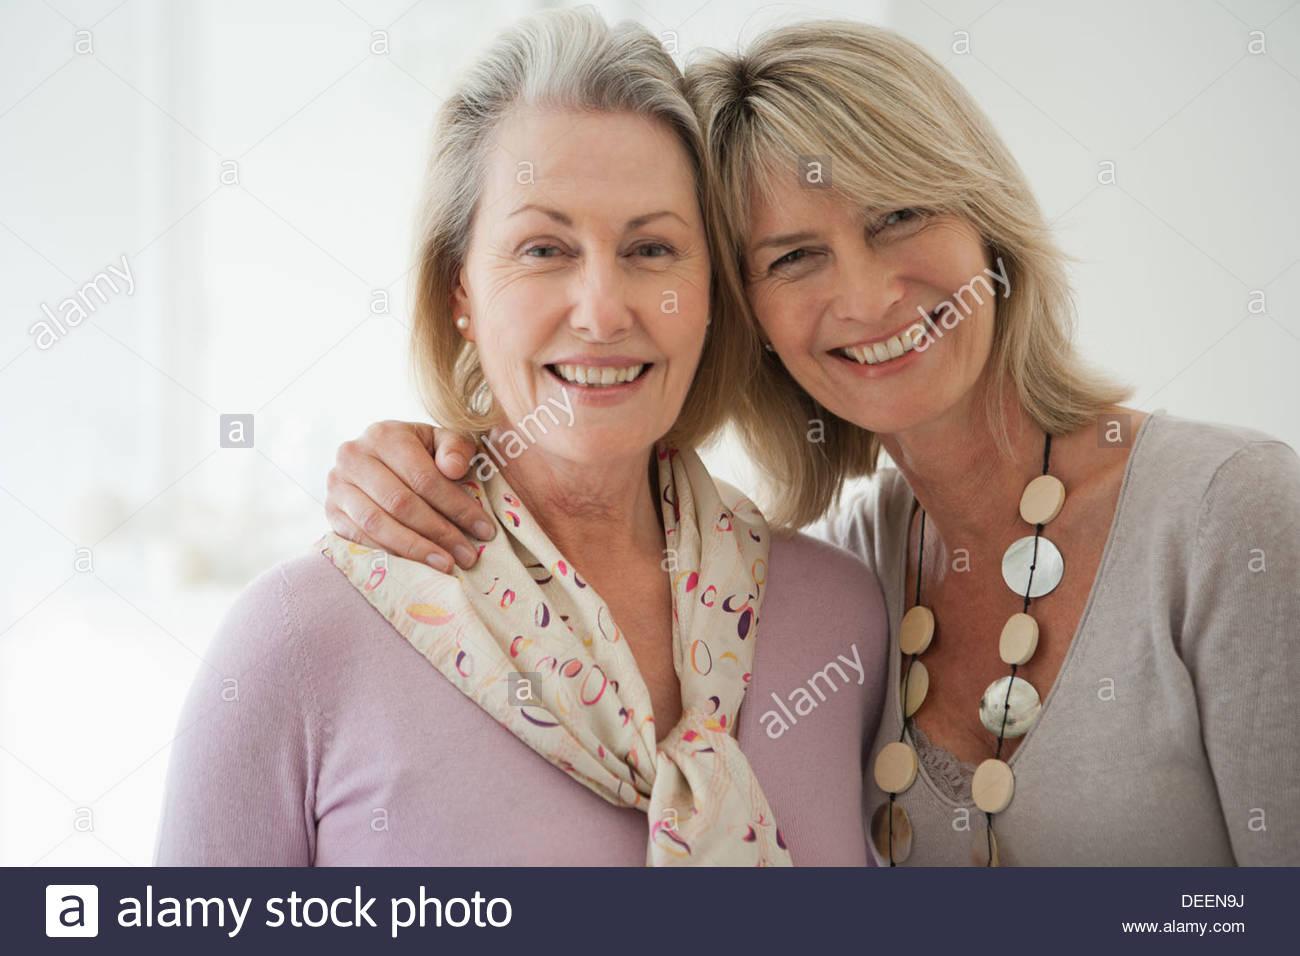 Smiling sisters hugging - Stock Image